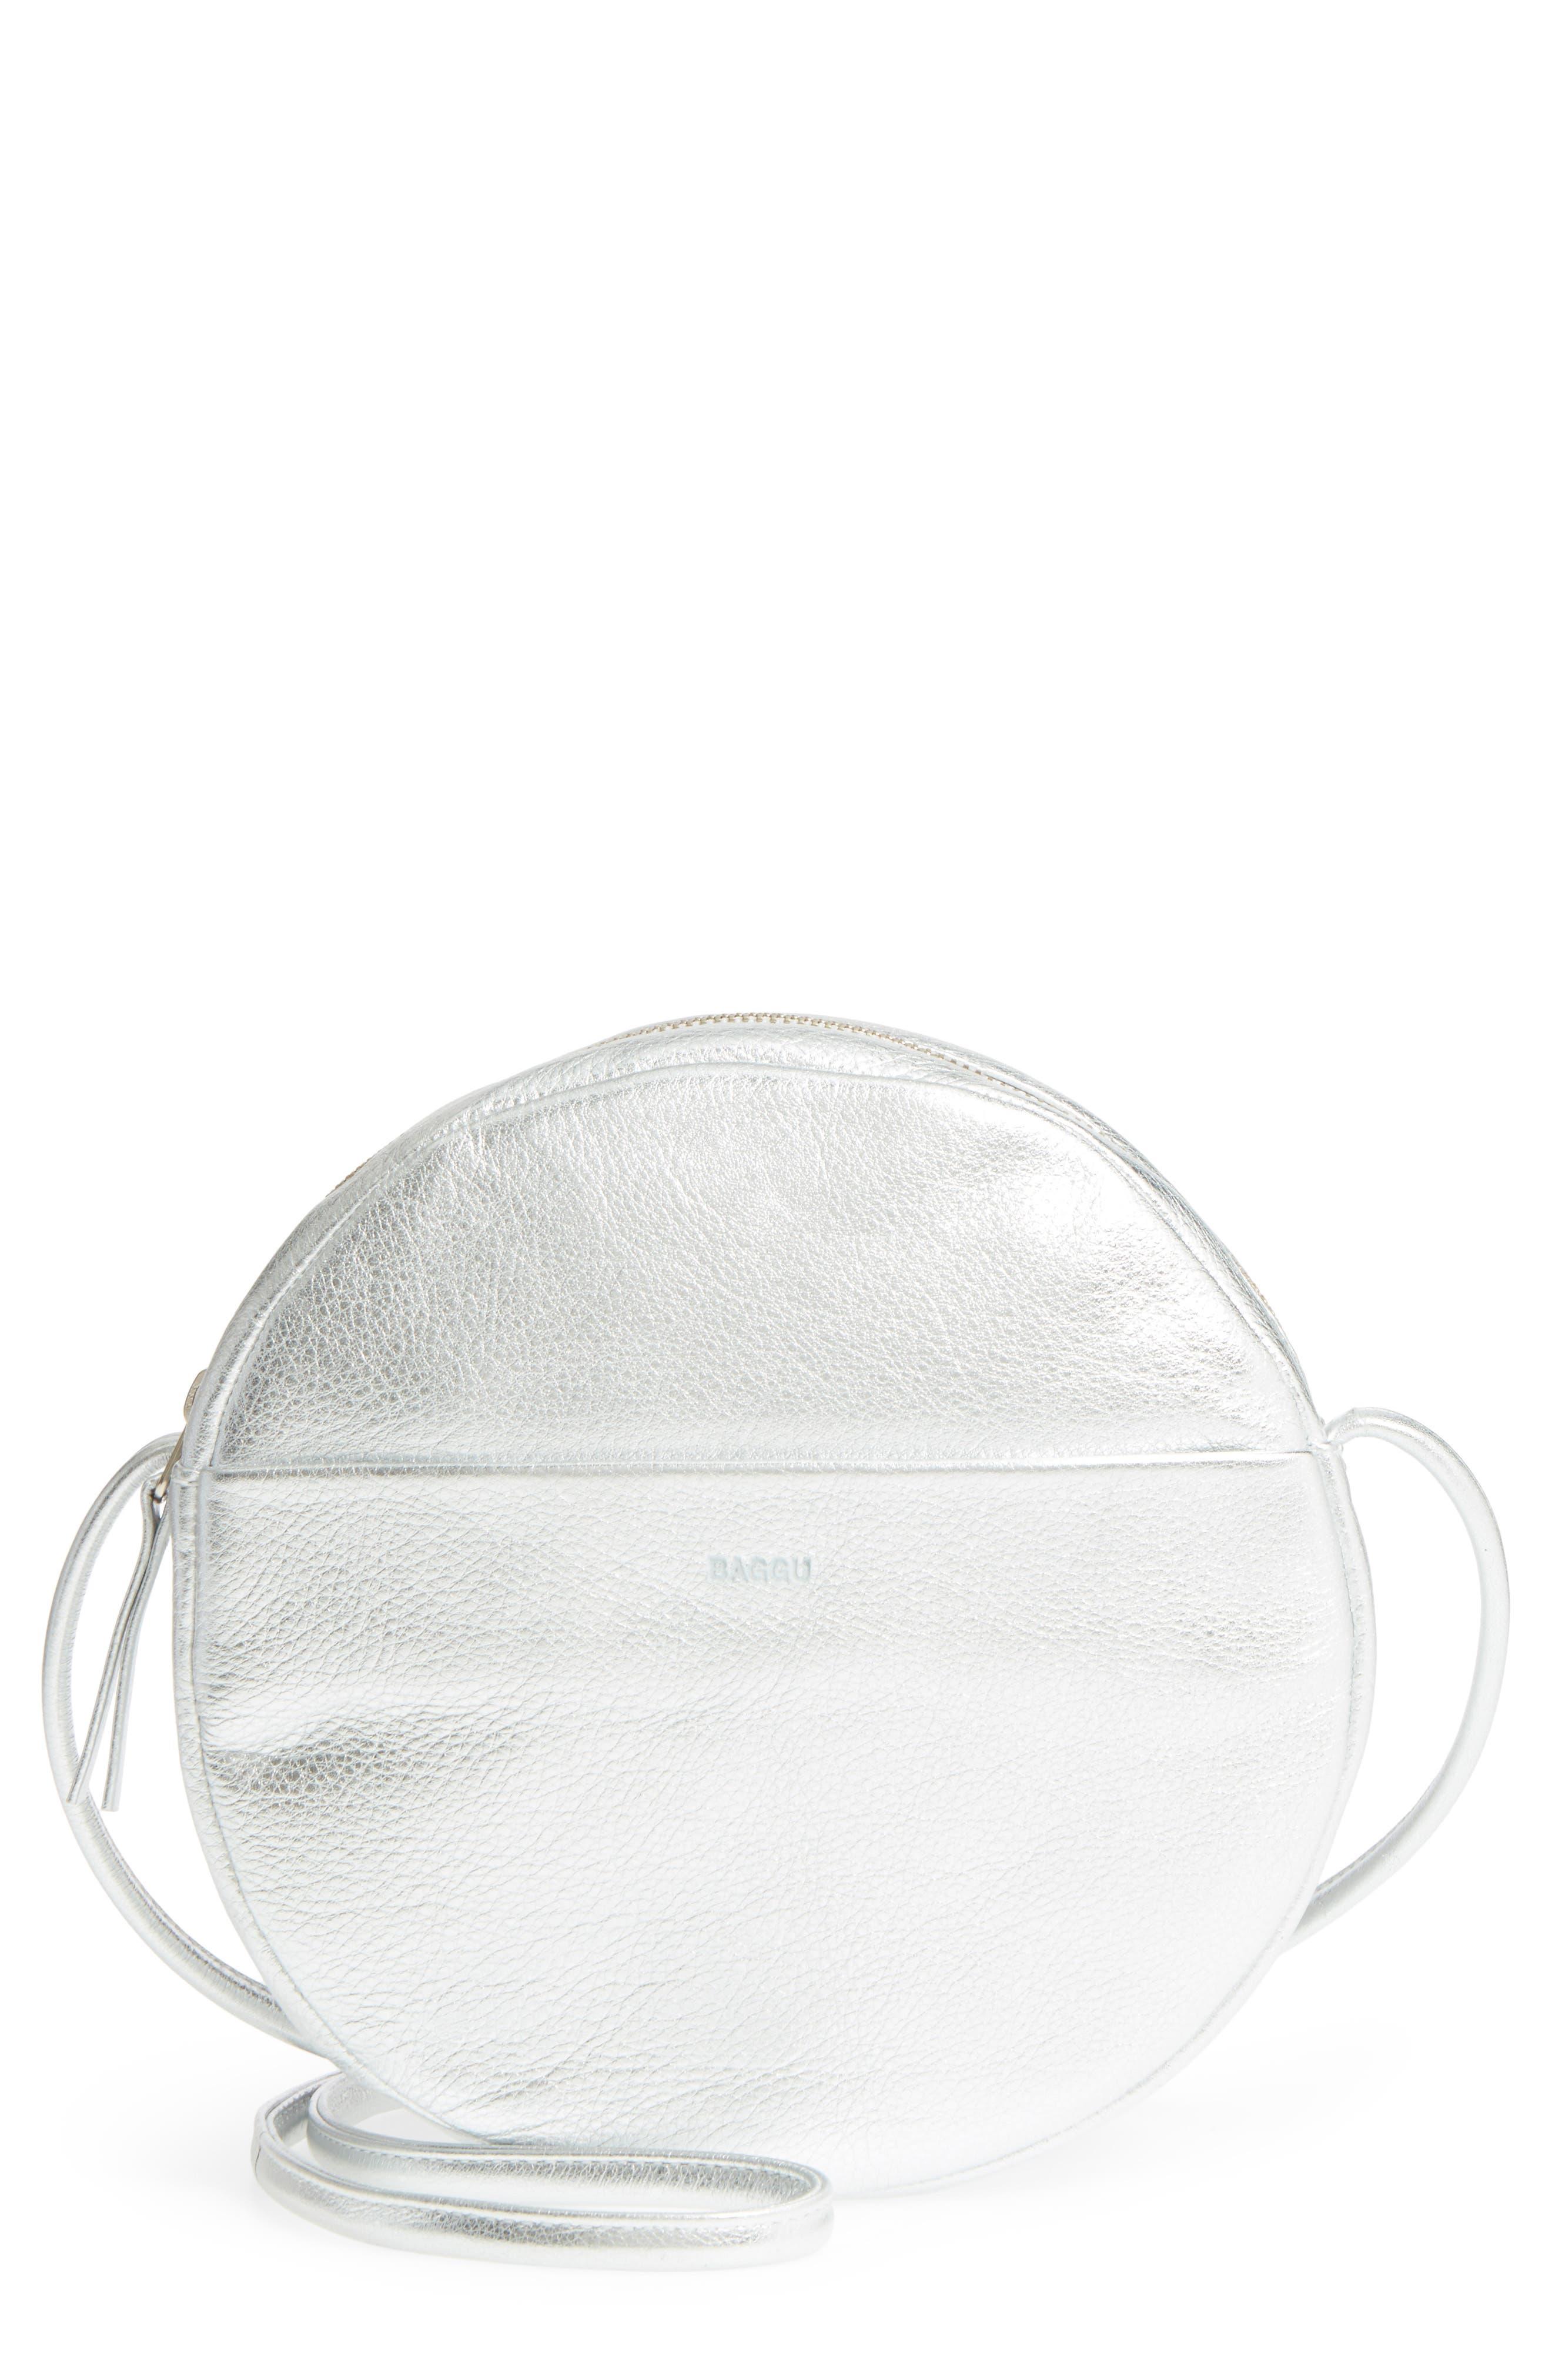 Circle Calfskin Leather Crossbody Bag,                             Main thumbnail 2, color,